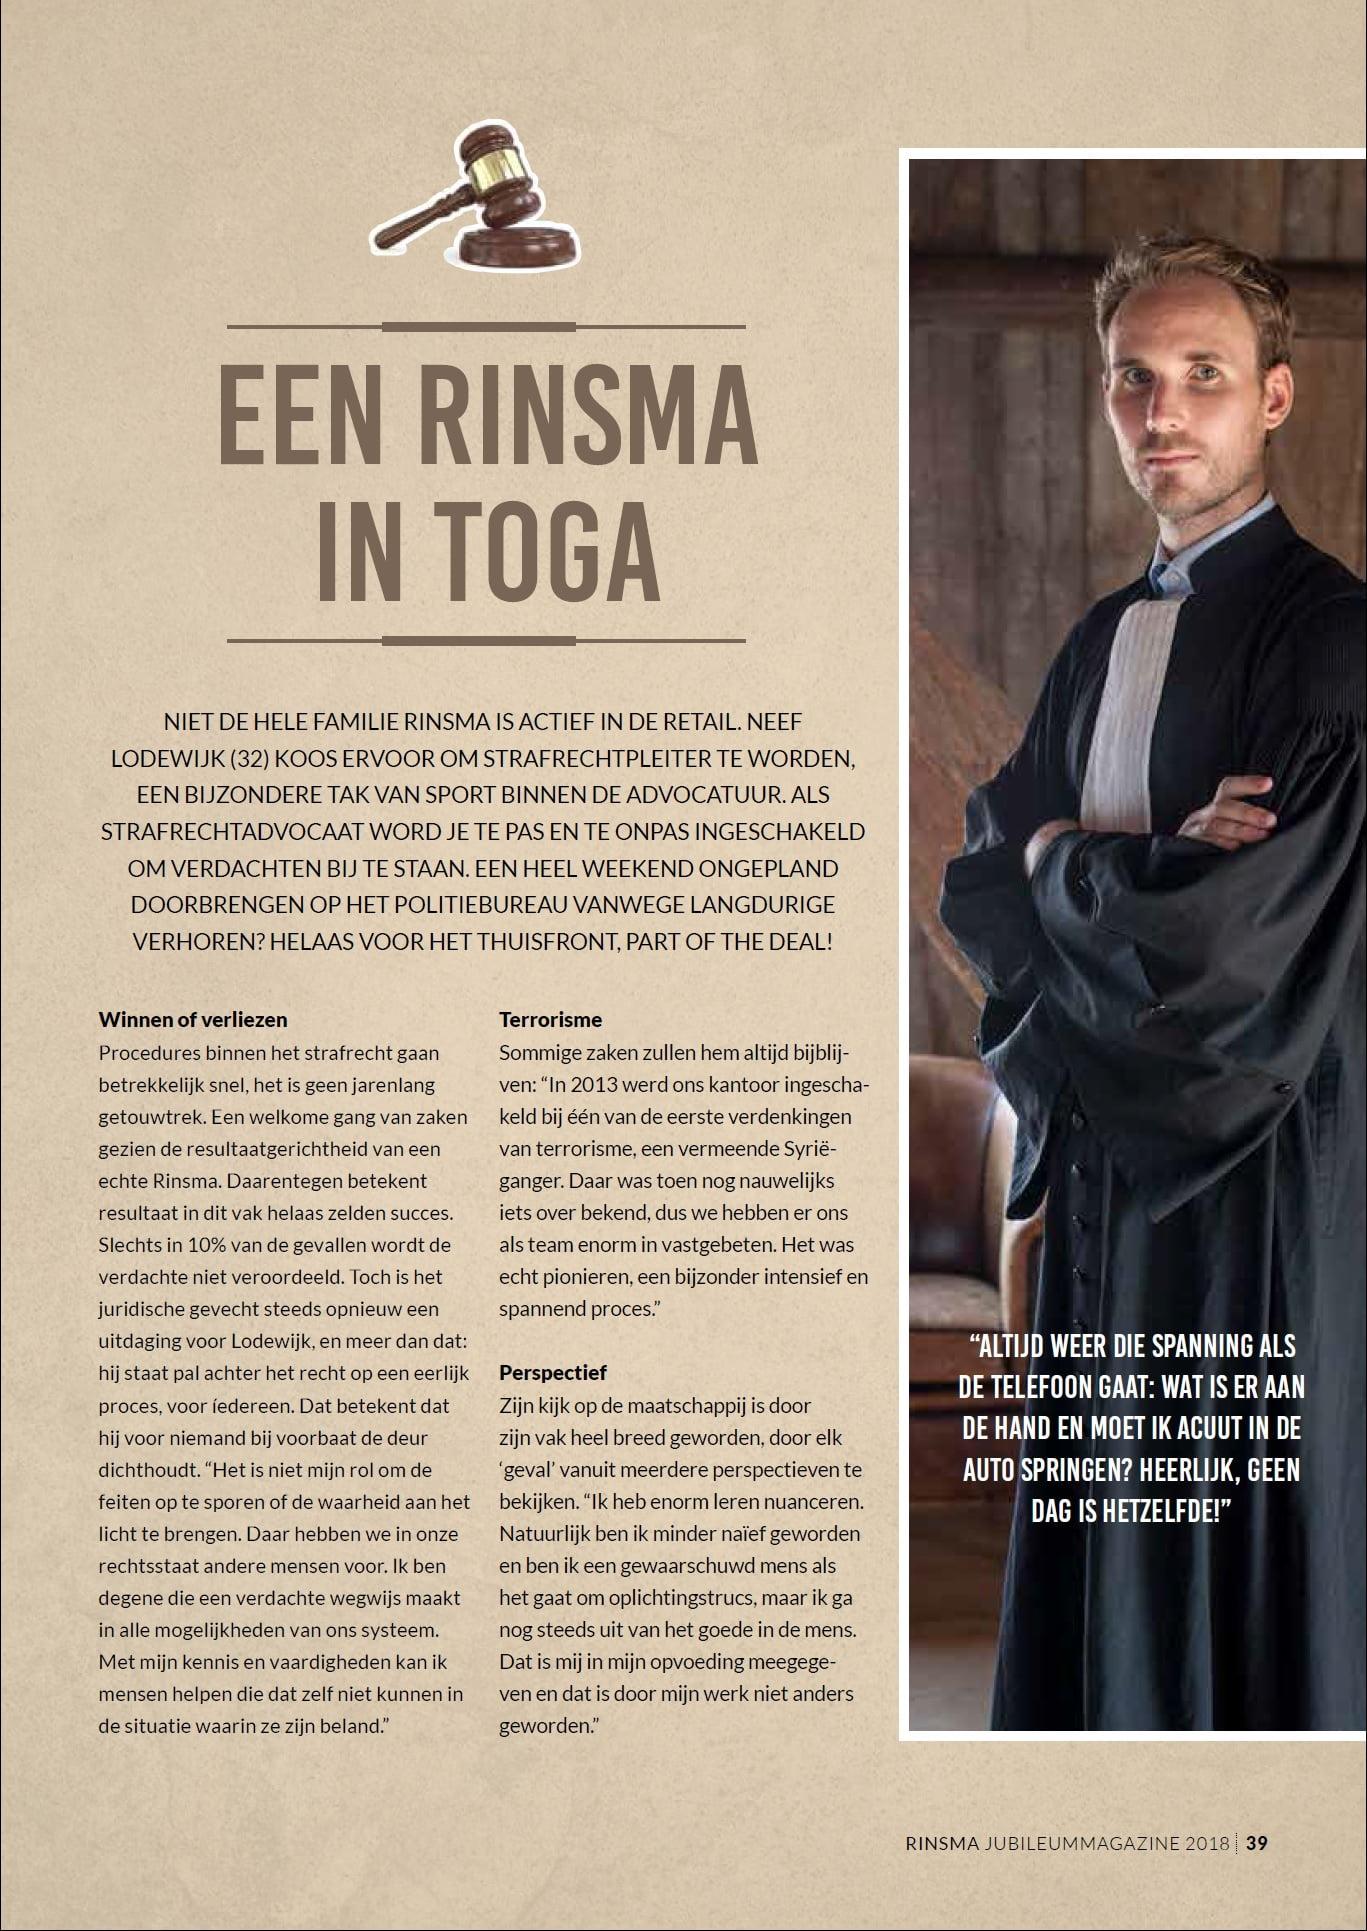 Een Rinsma in toga Rinsma fashion najaarsmagazine 2018